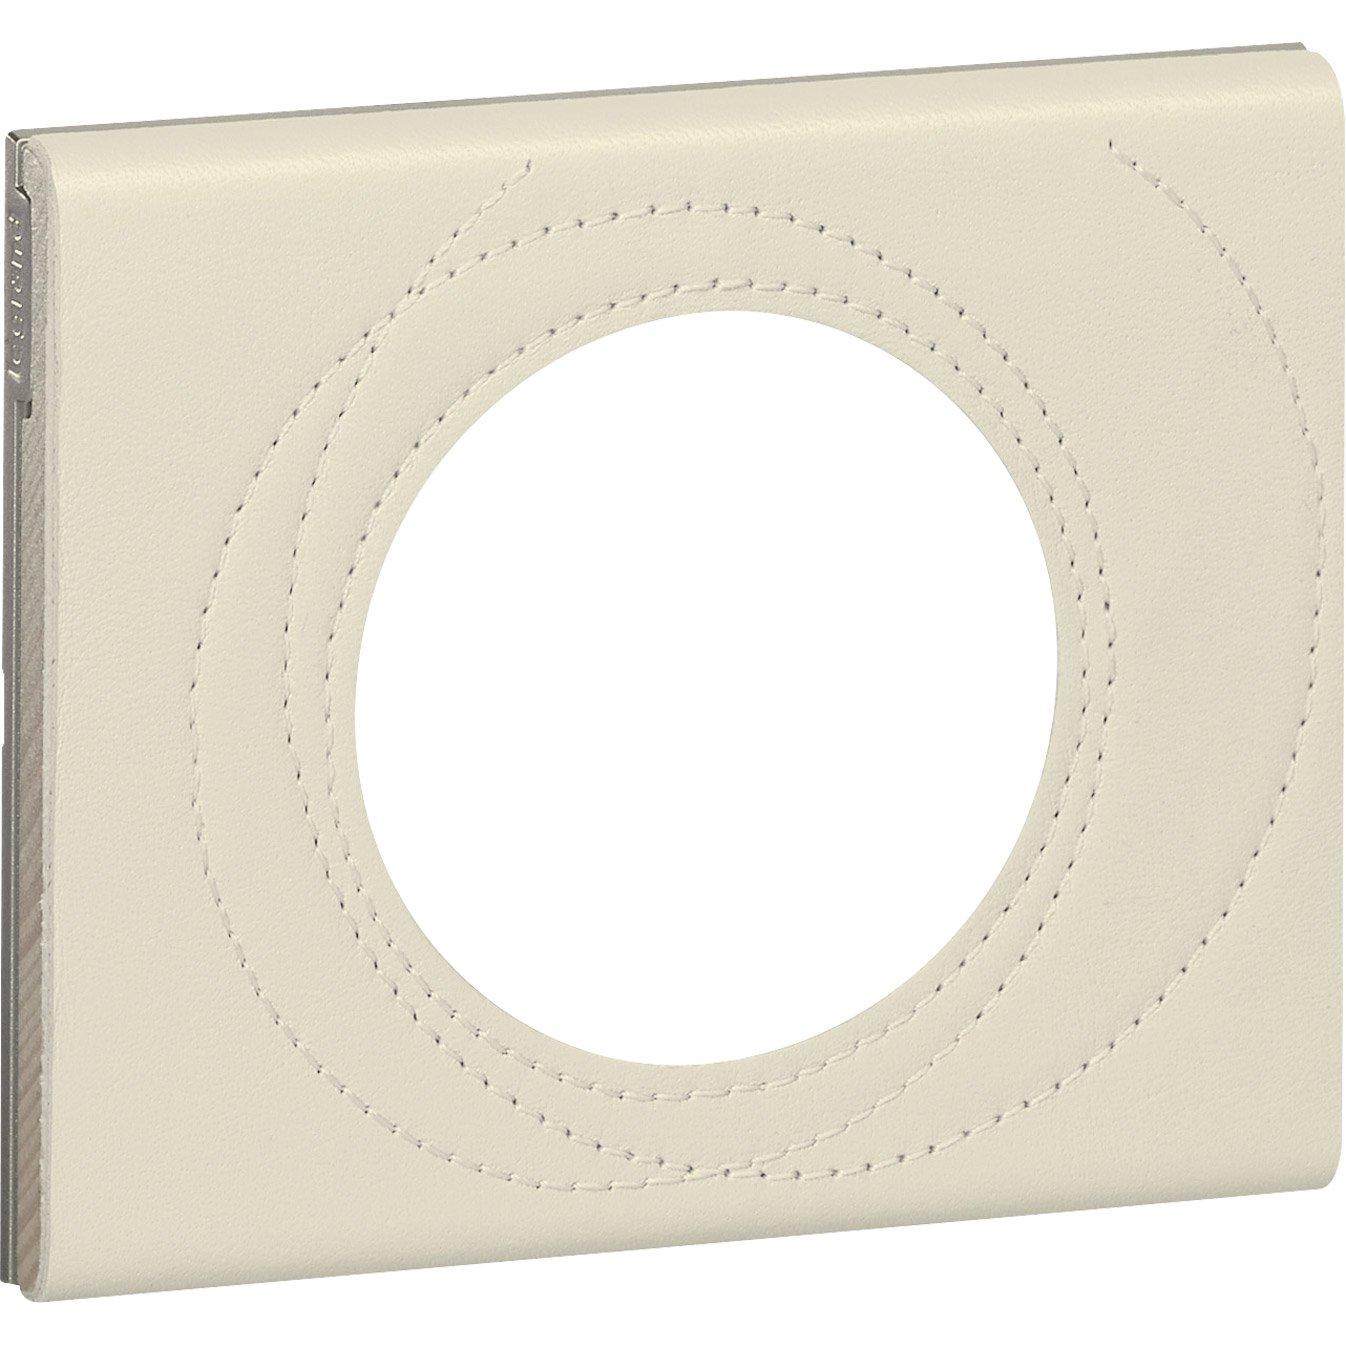 plaque c liane legrand perle couture mat leroy merlin. Black Bedroom Furniture Sets. Home Design Ideas